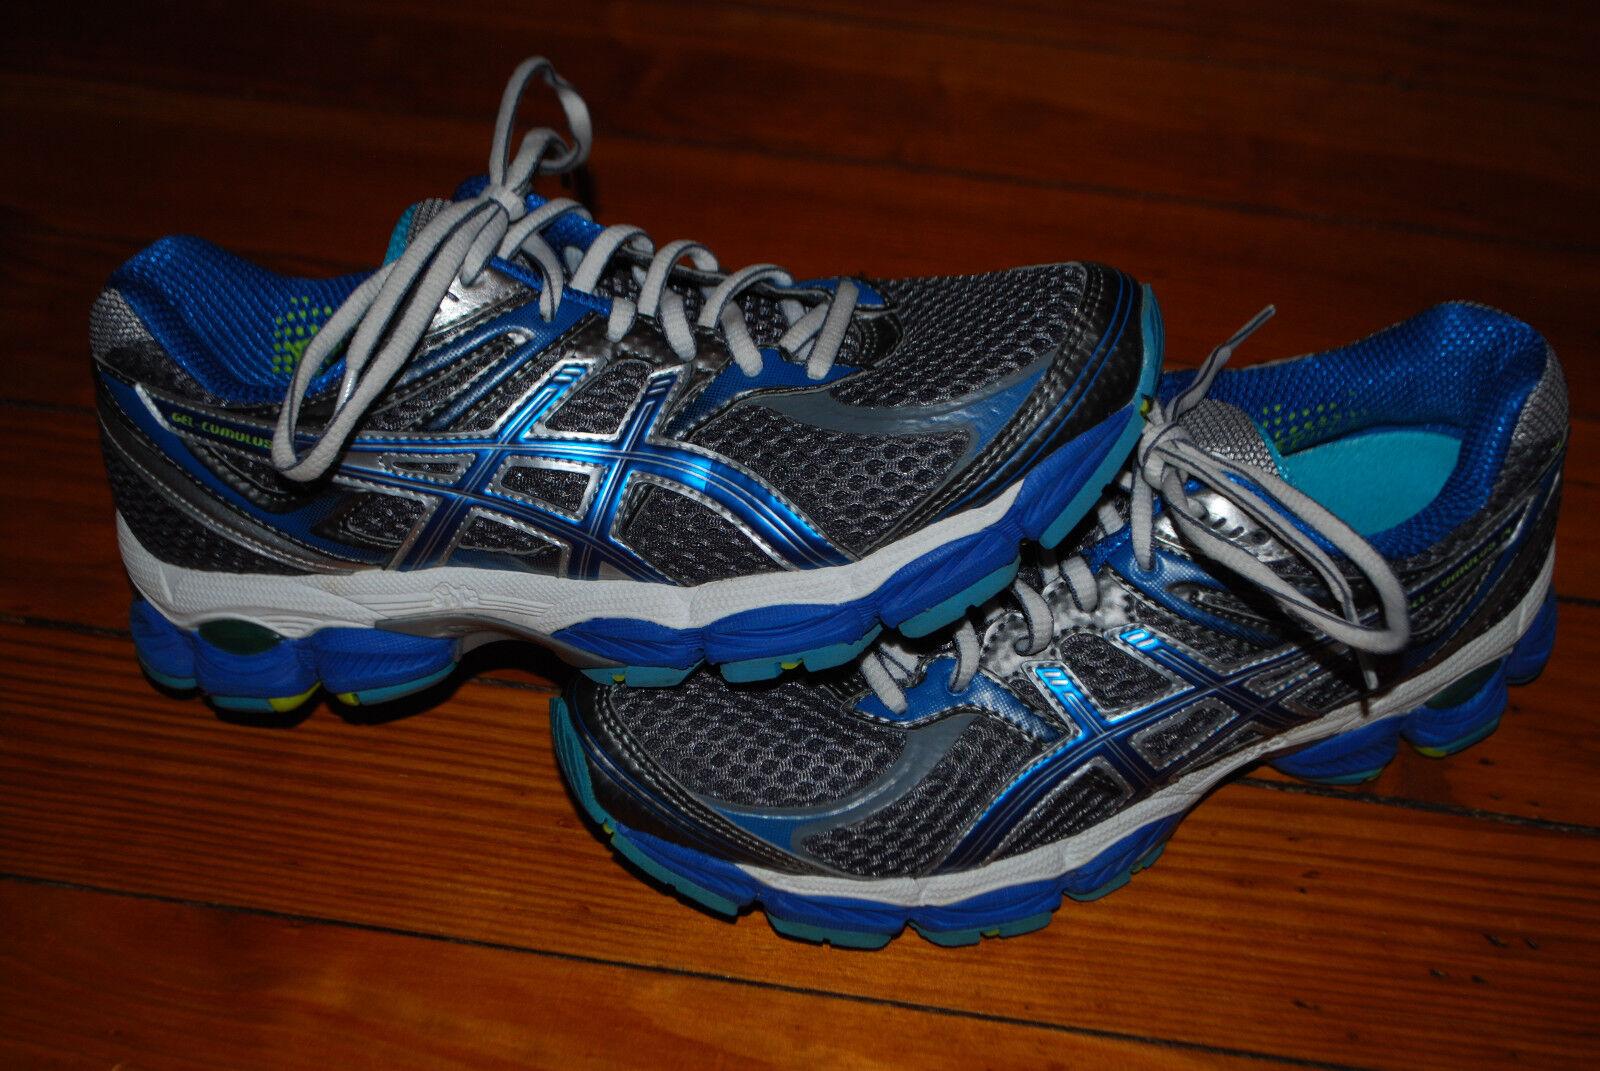 Women's Asics Gel Cumulus 14 Silver, Blue, Seafoam Running Sneaker (6.5)